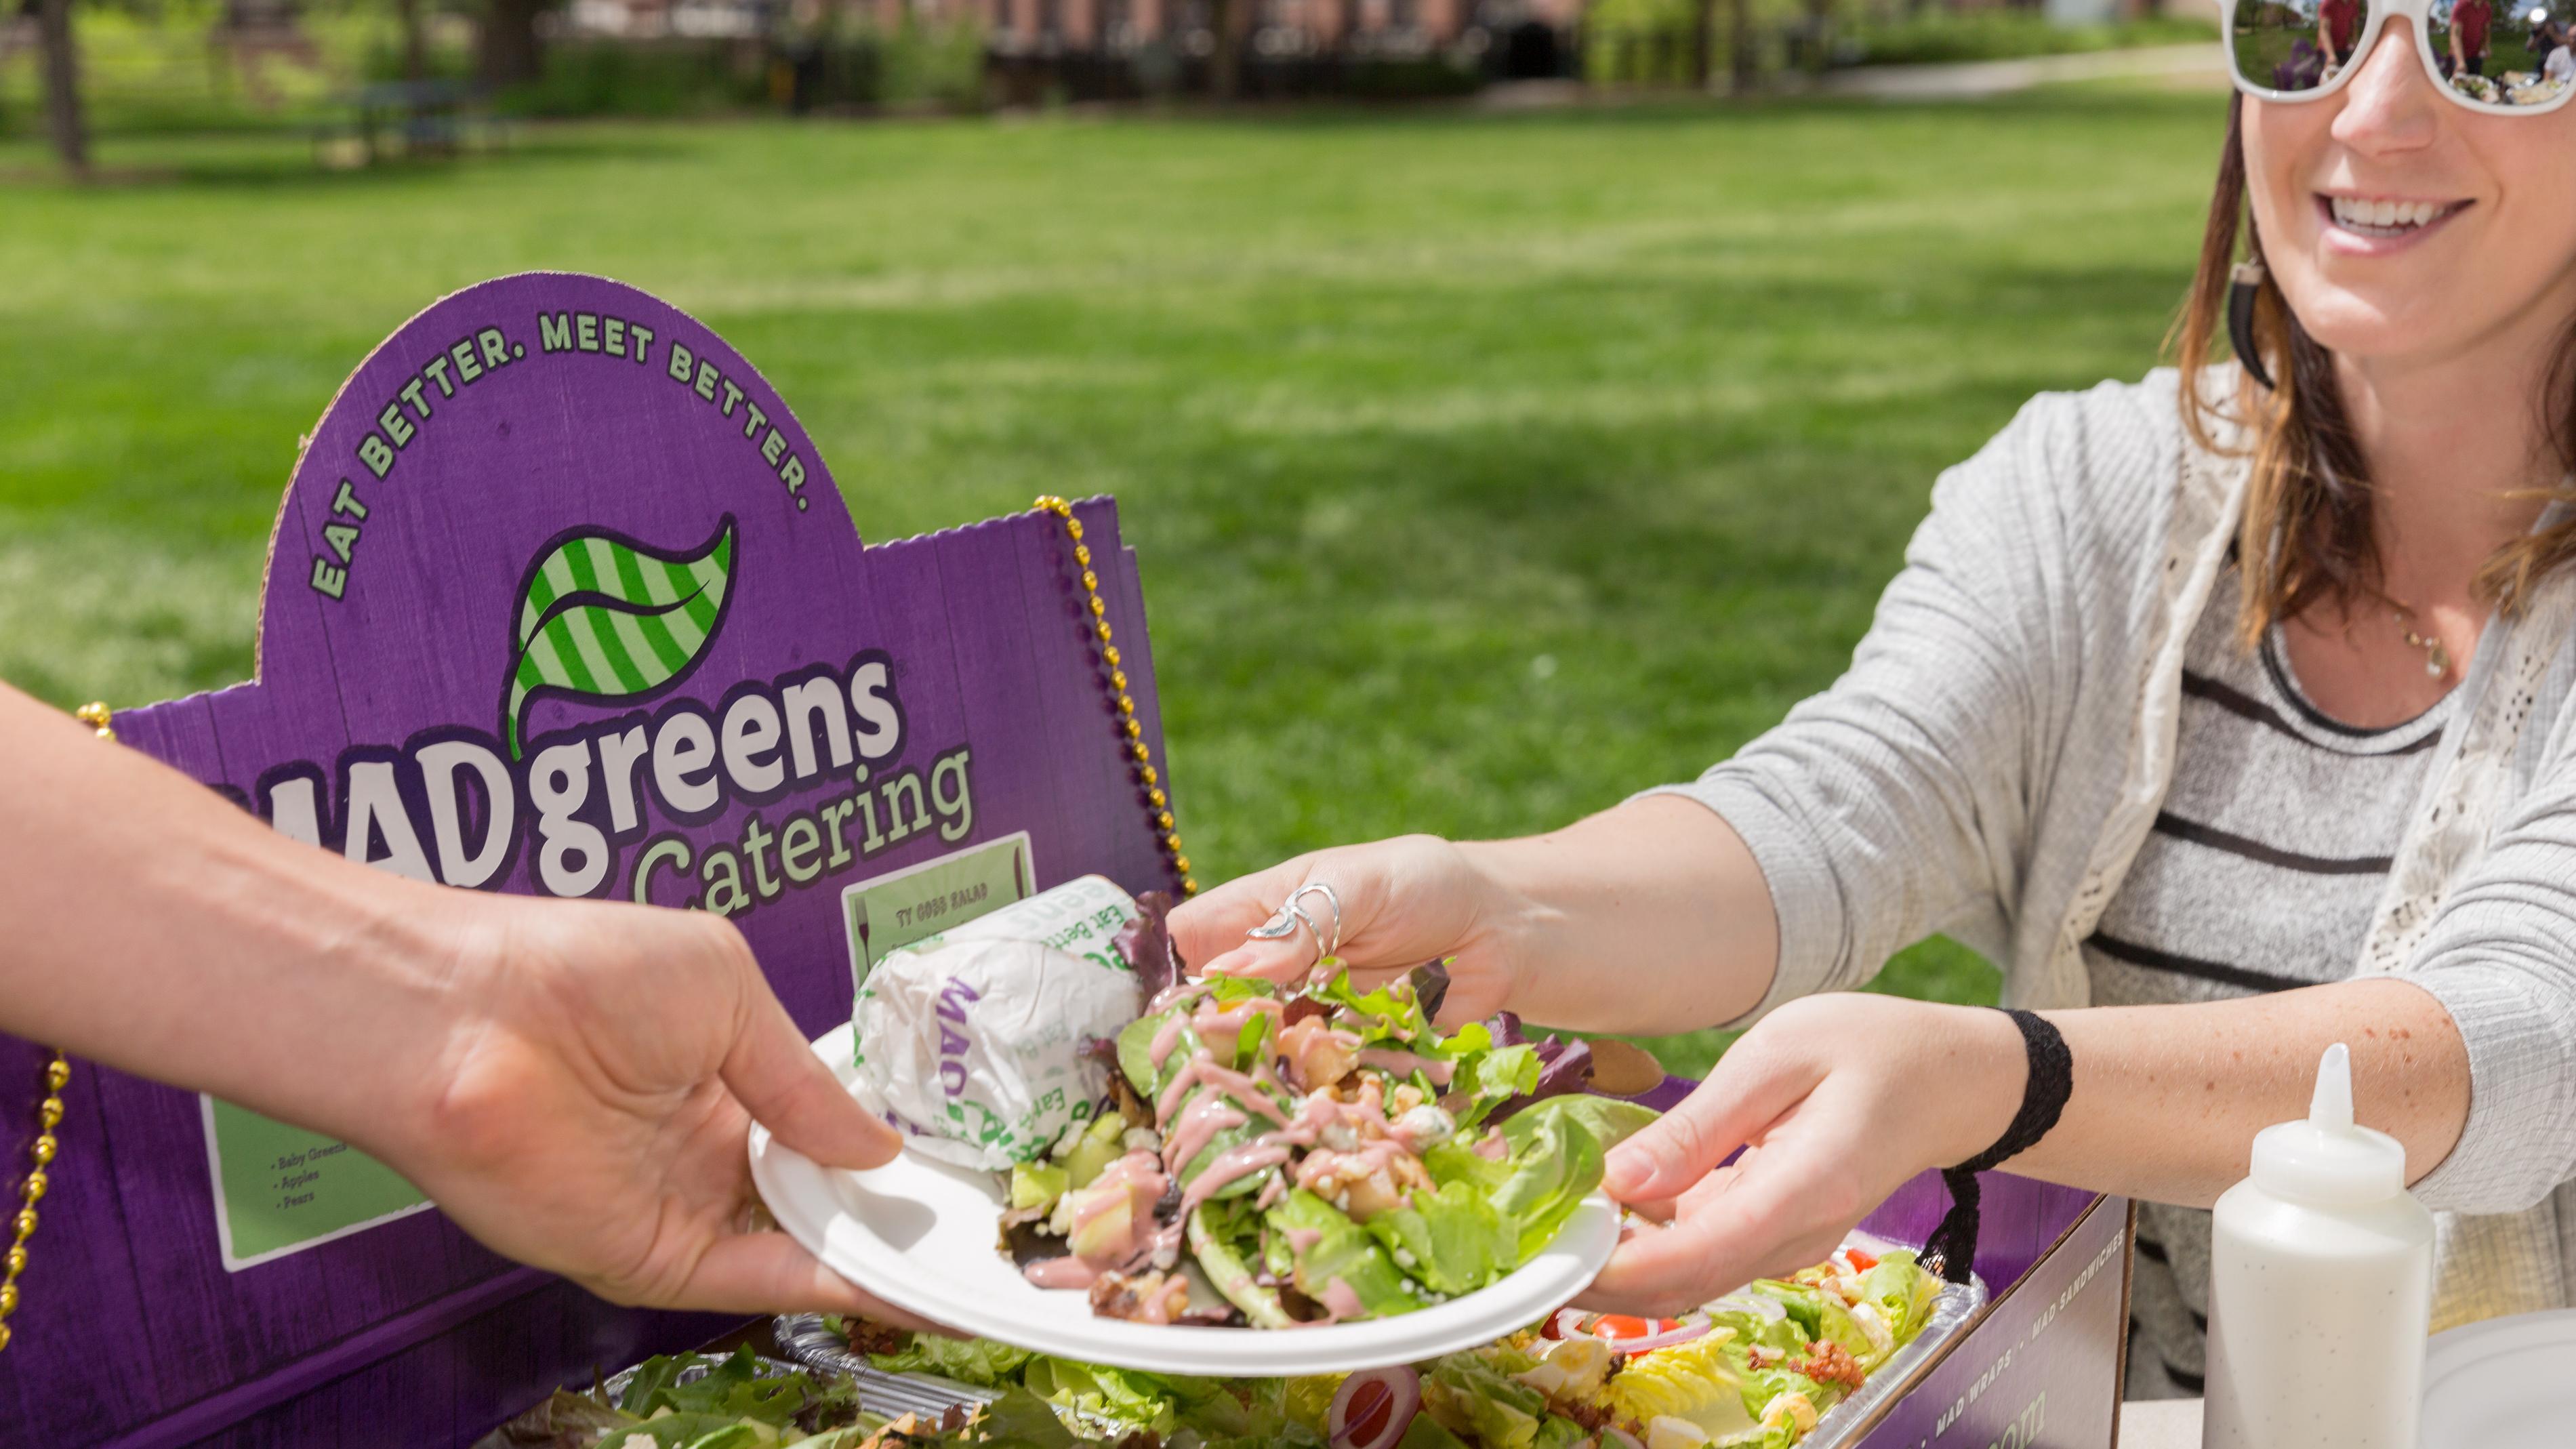 MAD Greens Salads - Downtown Denver logo